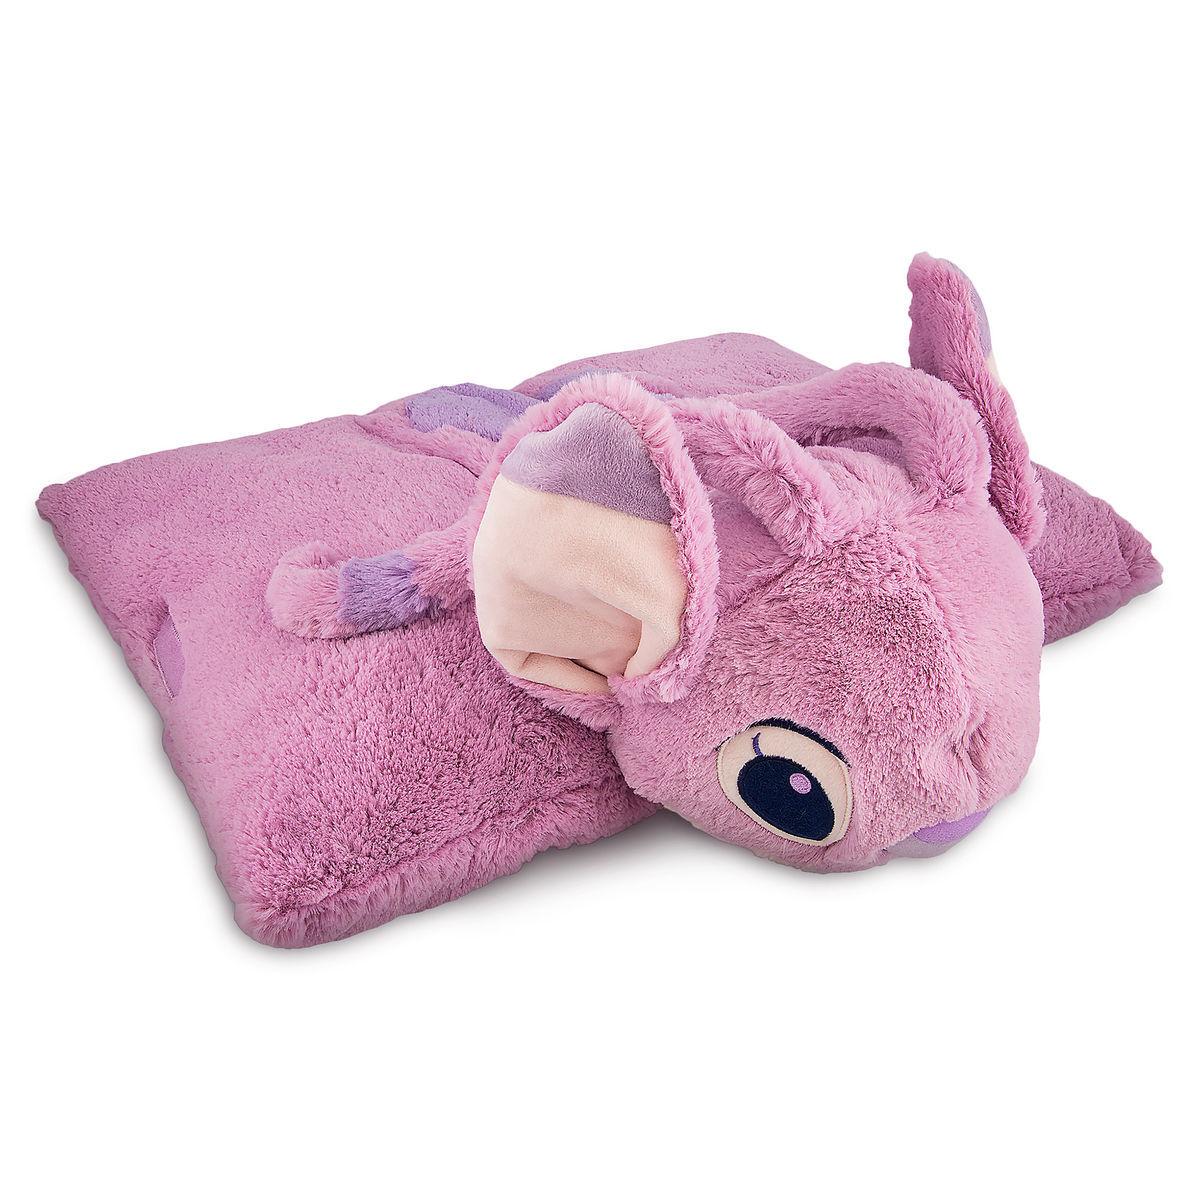 disney pillow pet angel plush